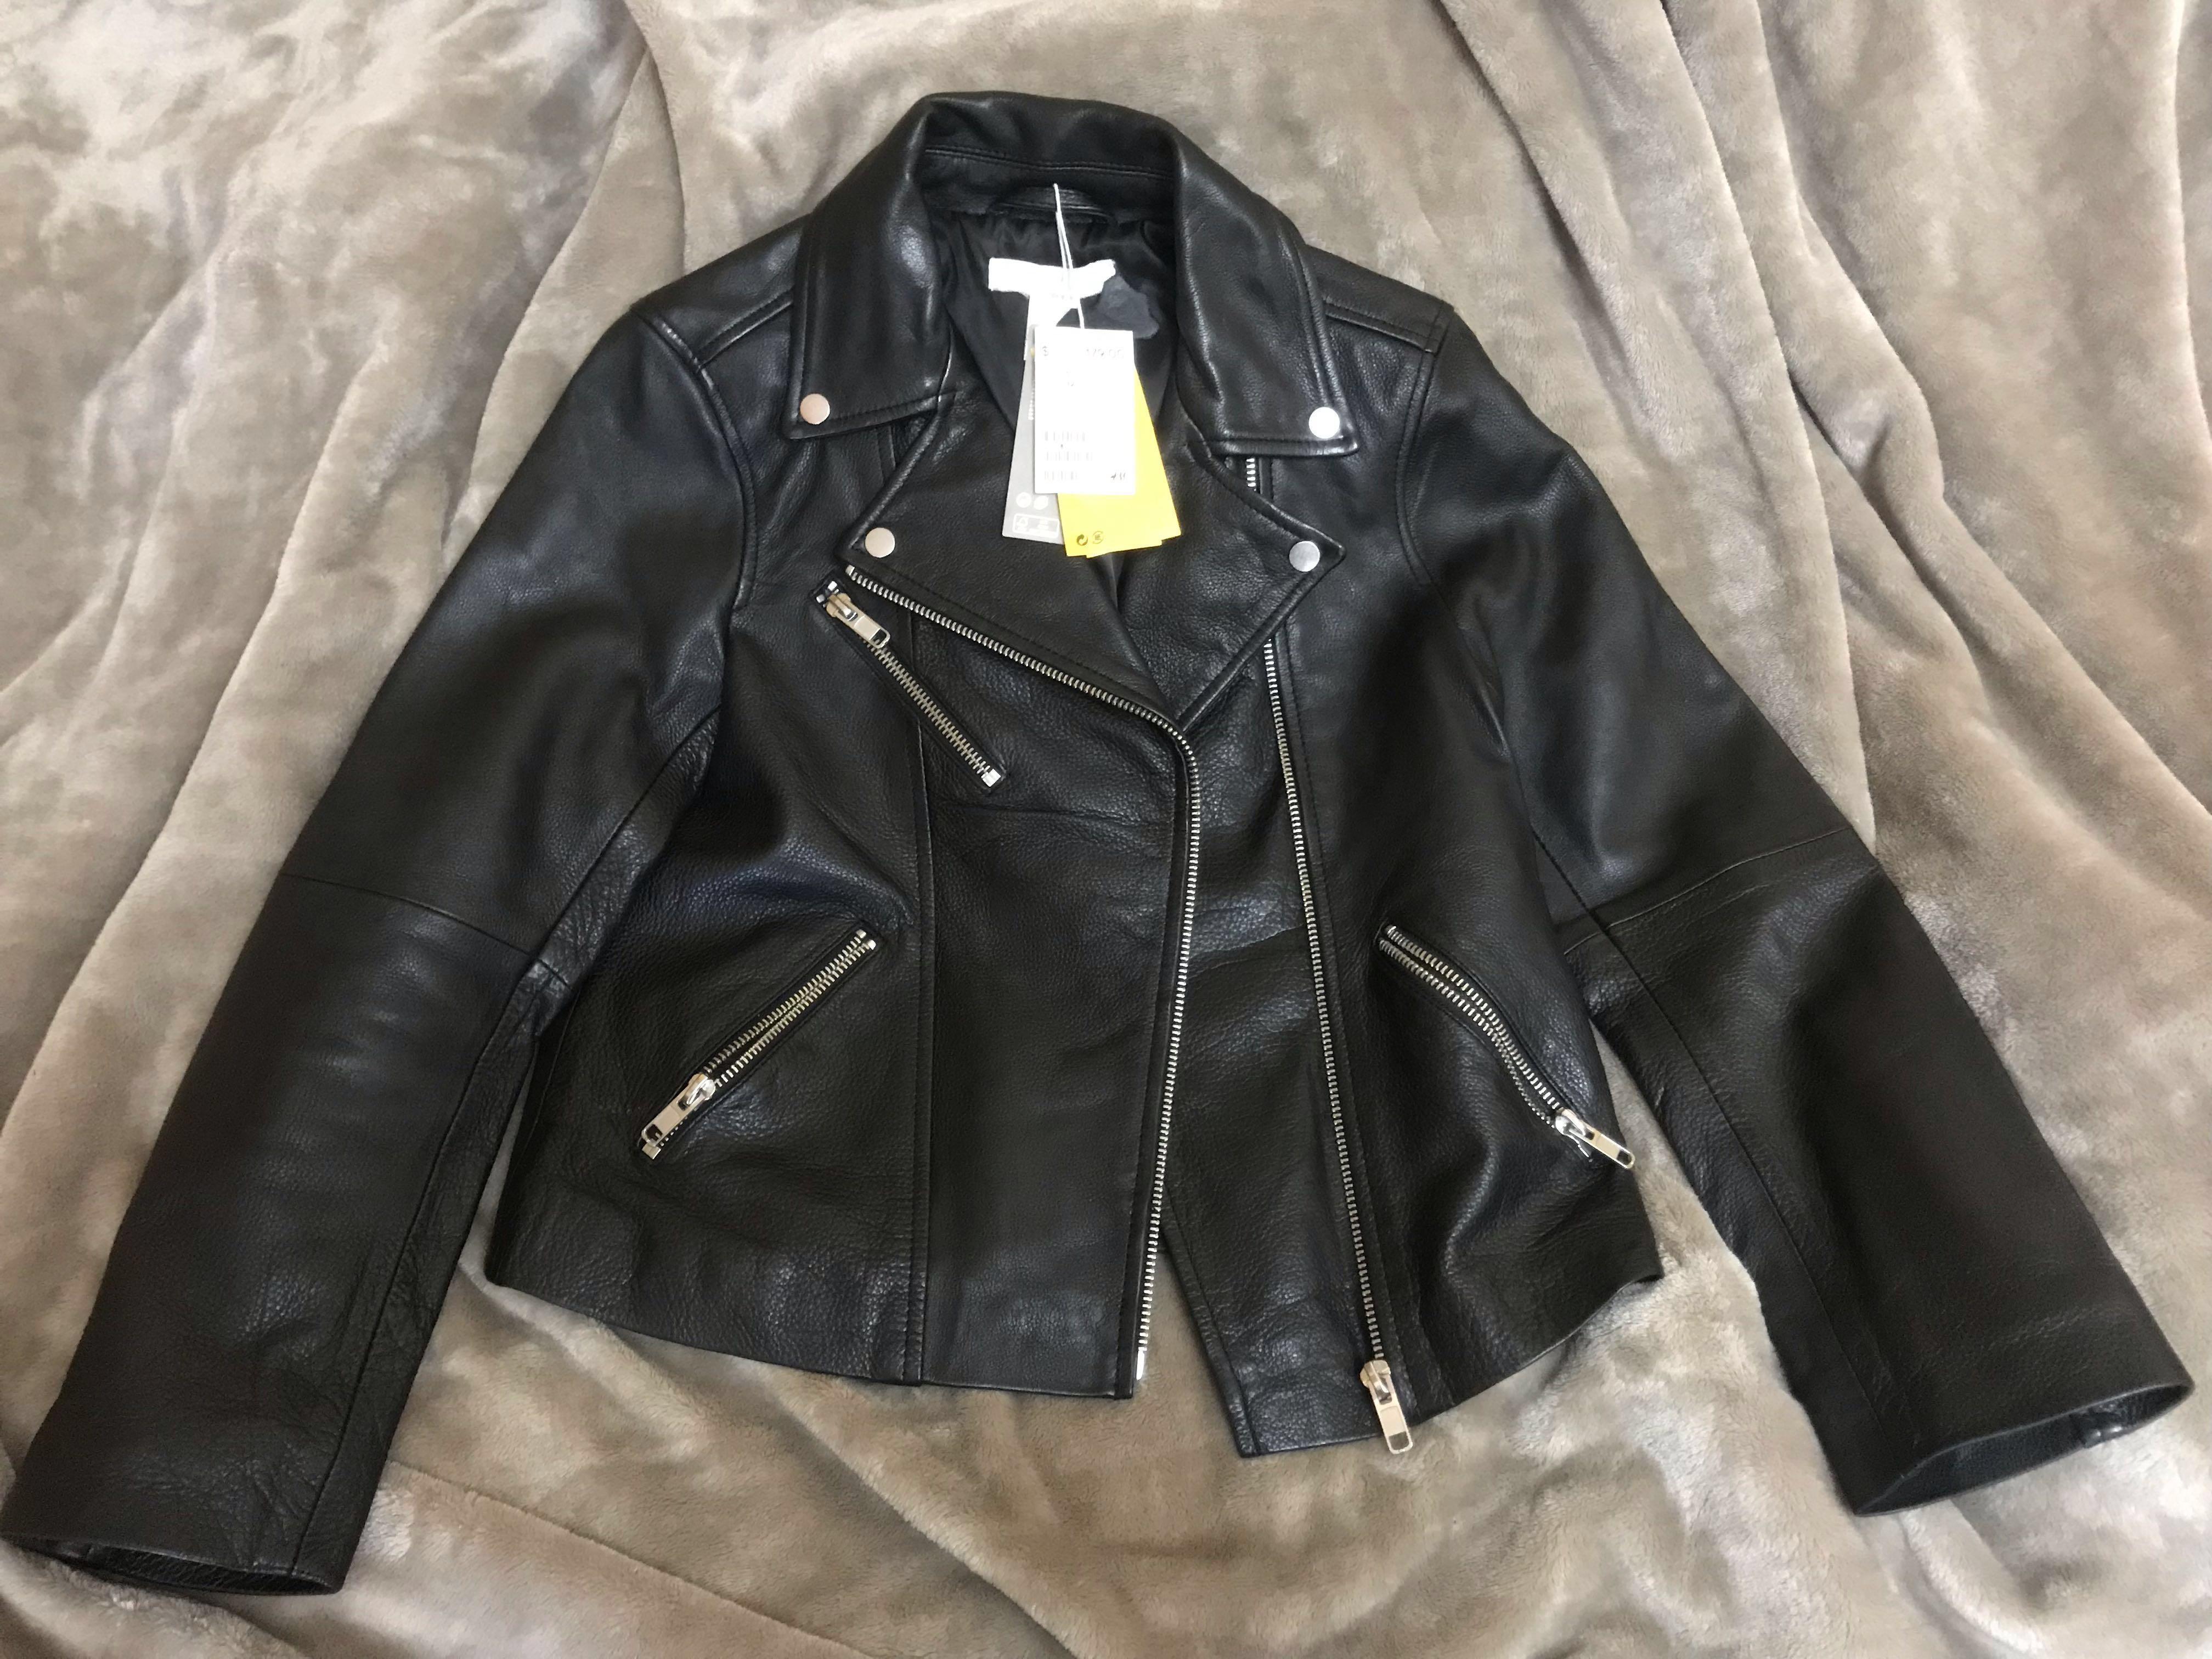 H&M premium leather jacket